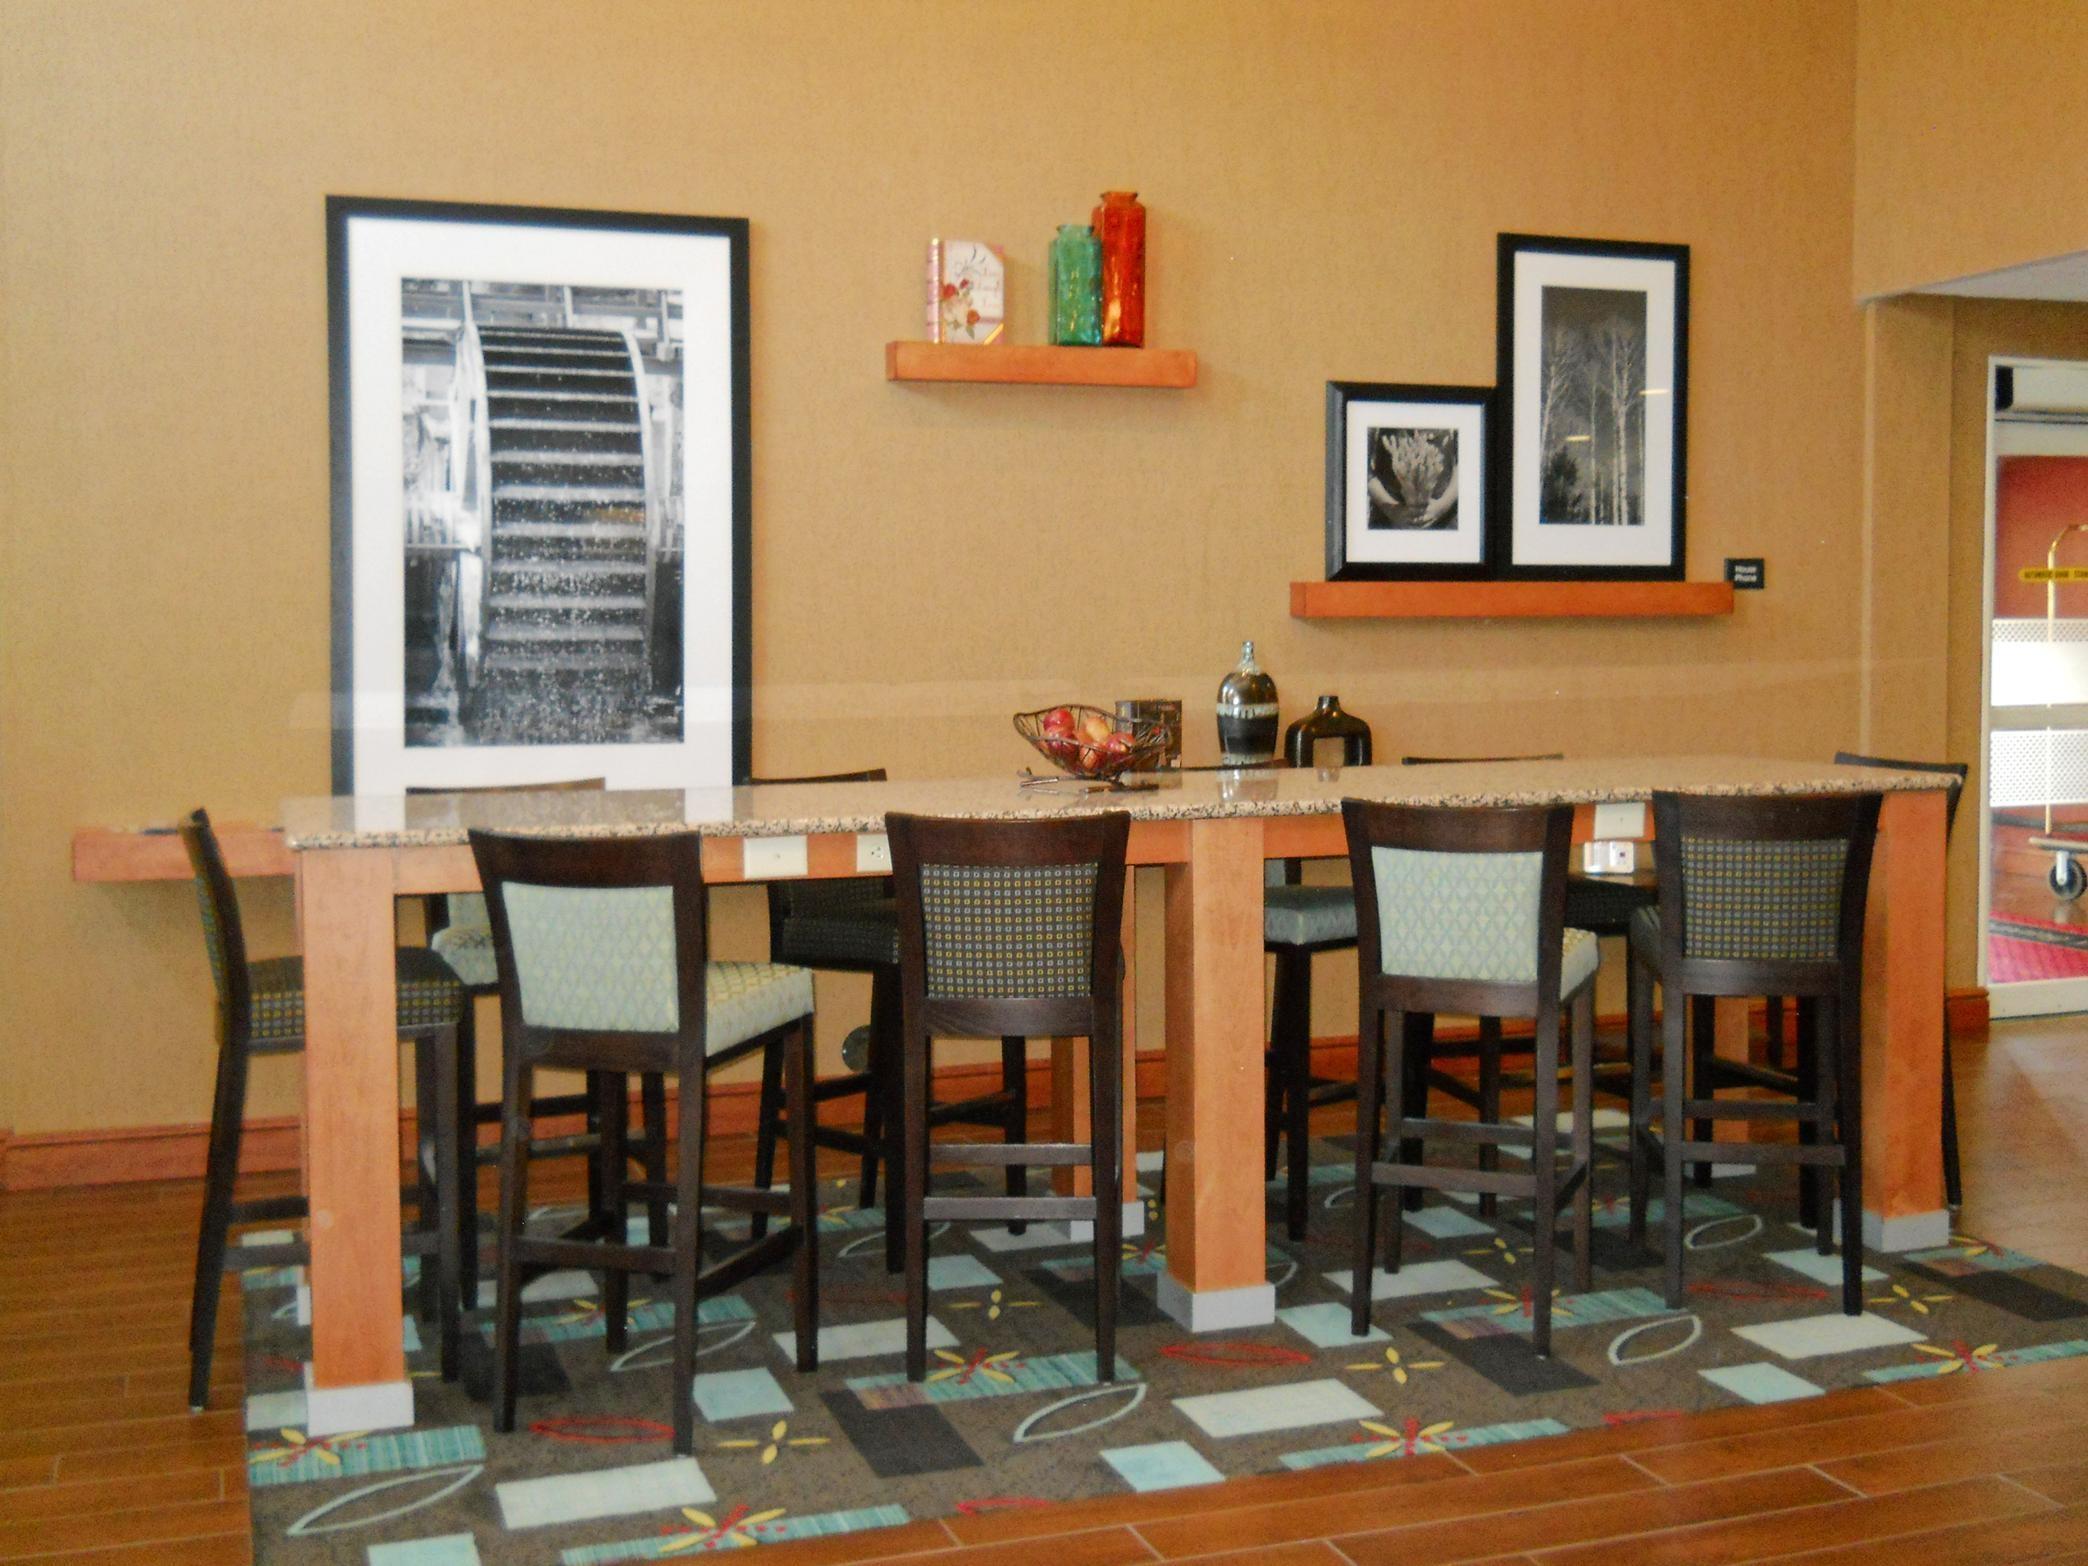 Hampton Inn & Suites Greenfield image 24